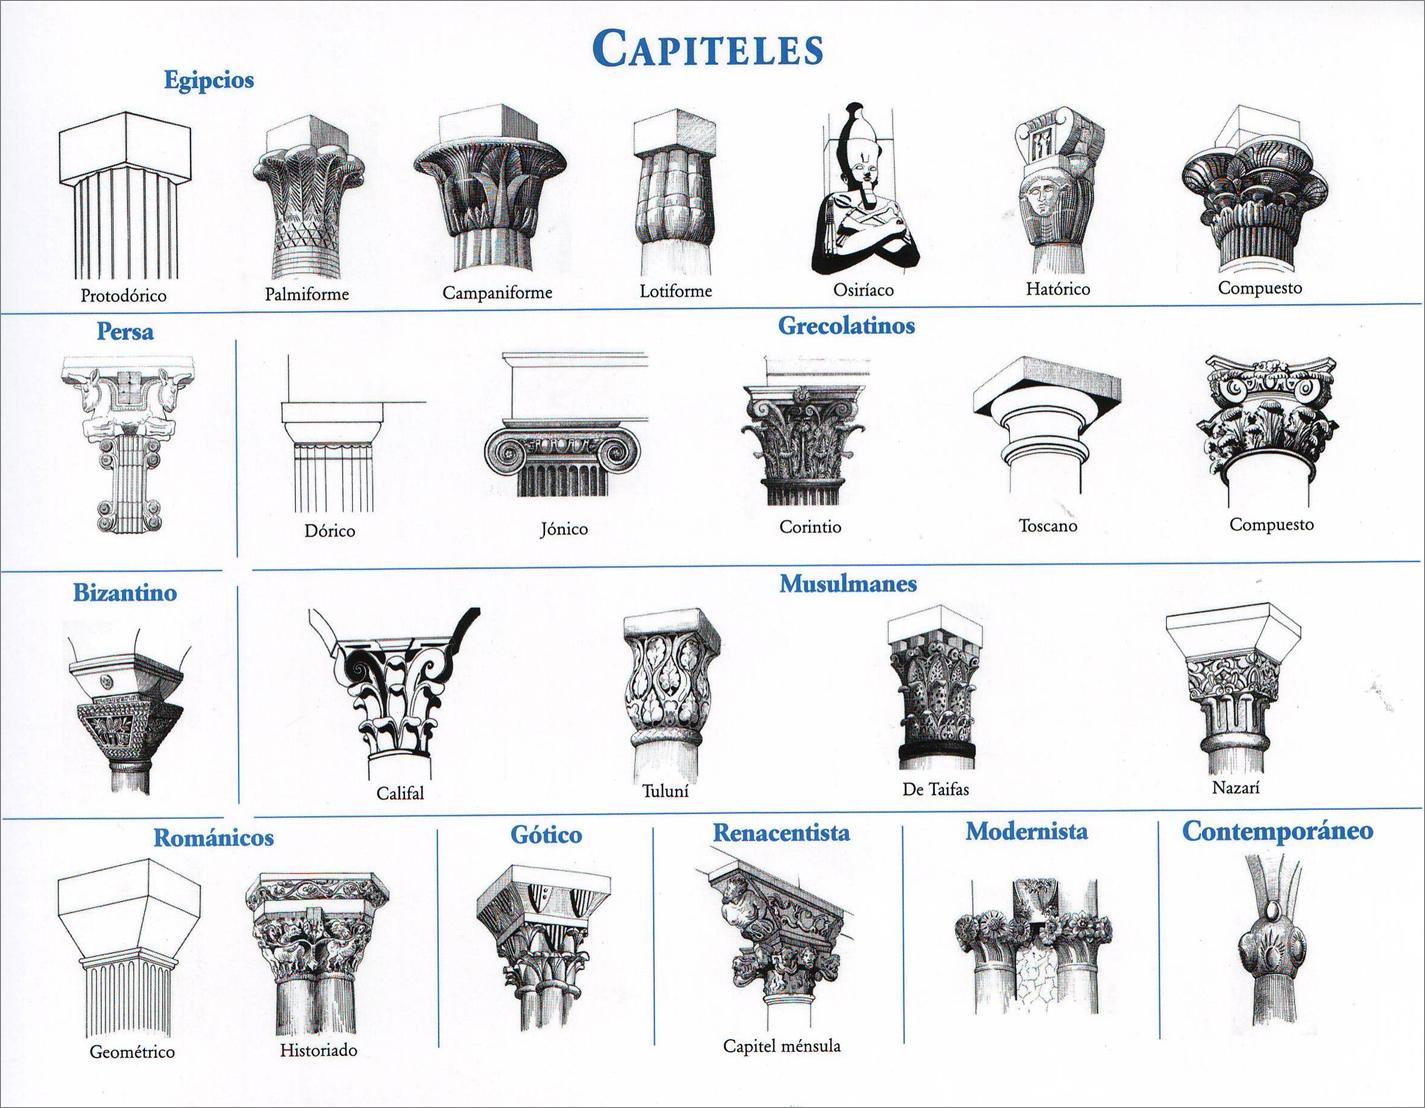 El Rincon Del Arte Elementos Arquitectonicos Columnas Arquitectura Capiteles Tipos De Columnas